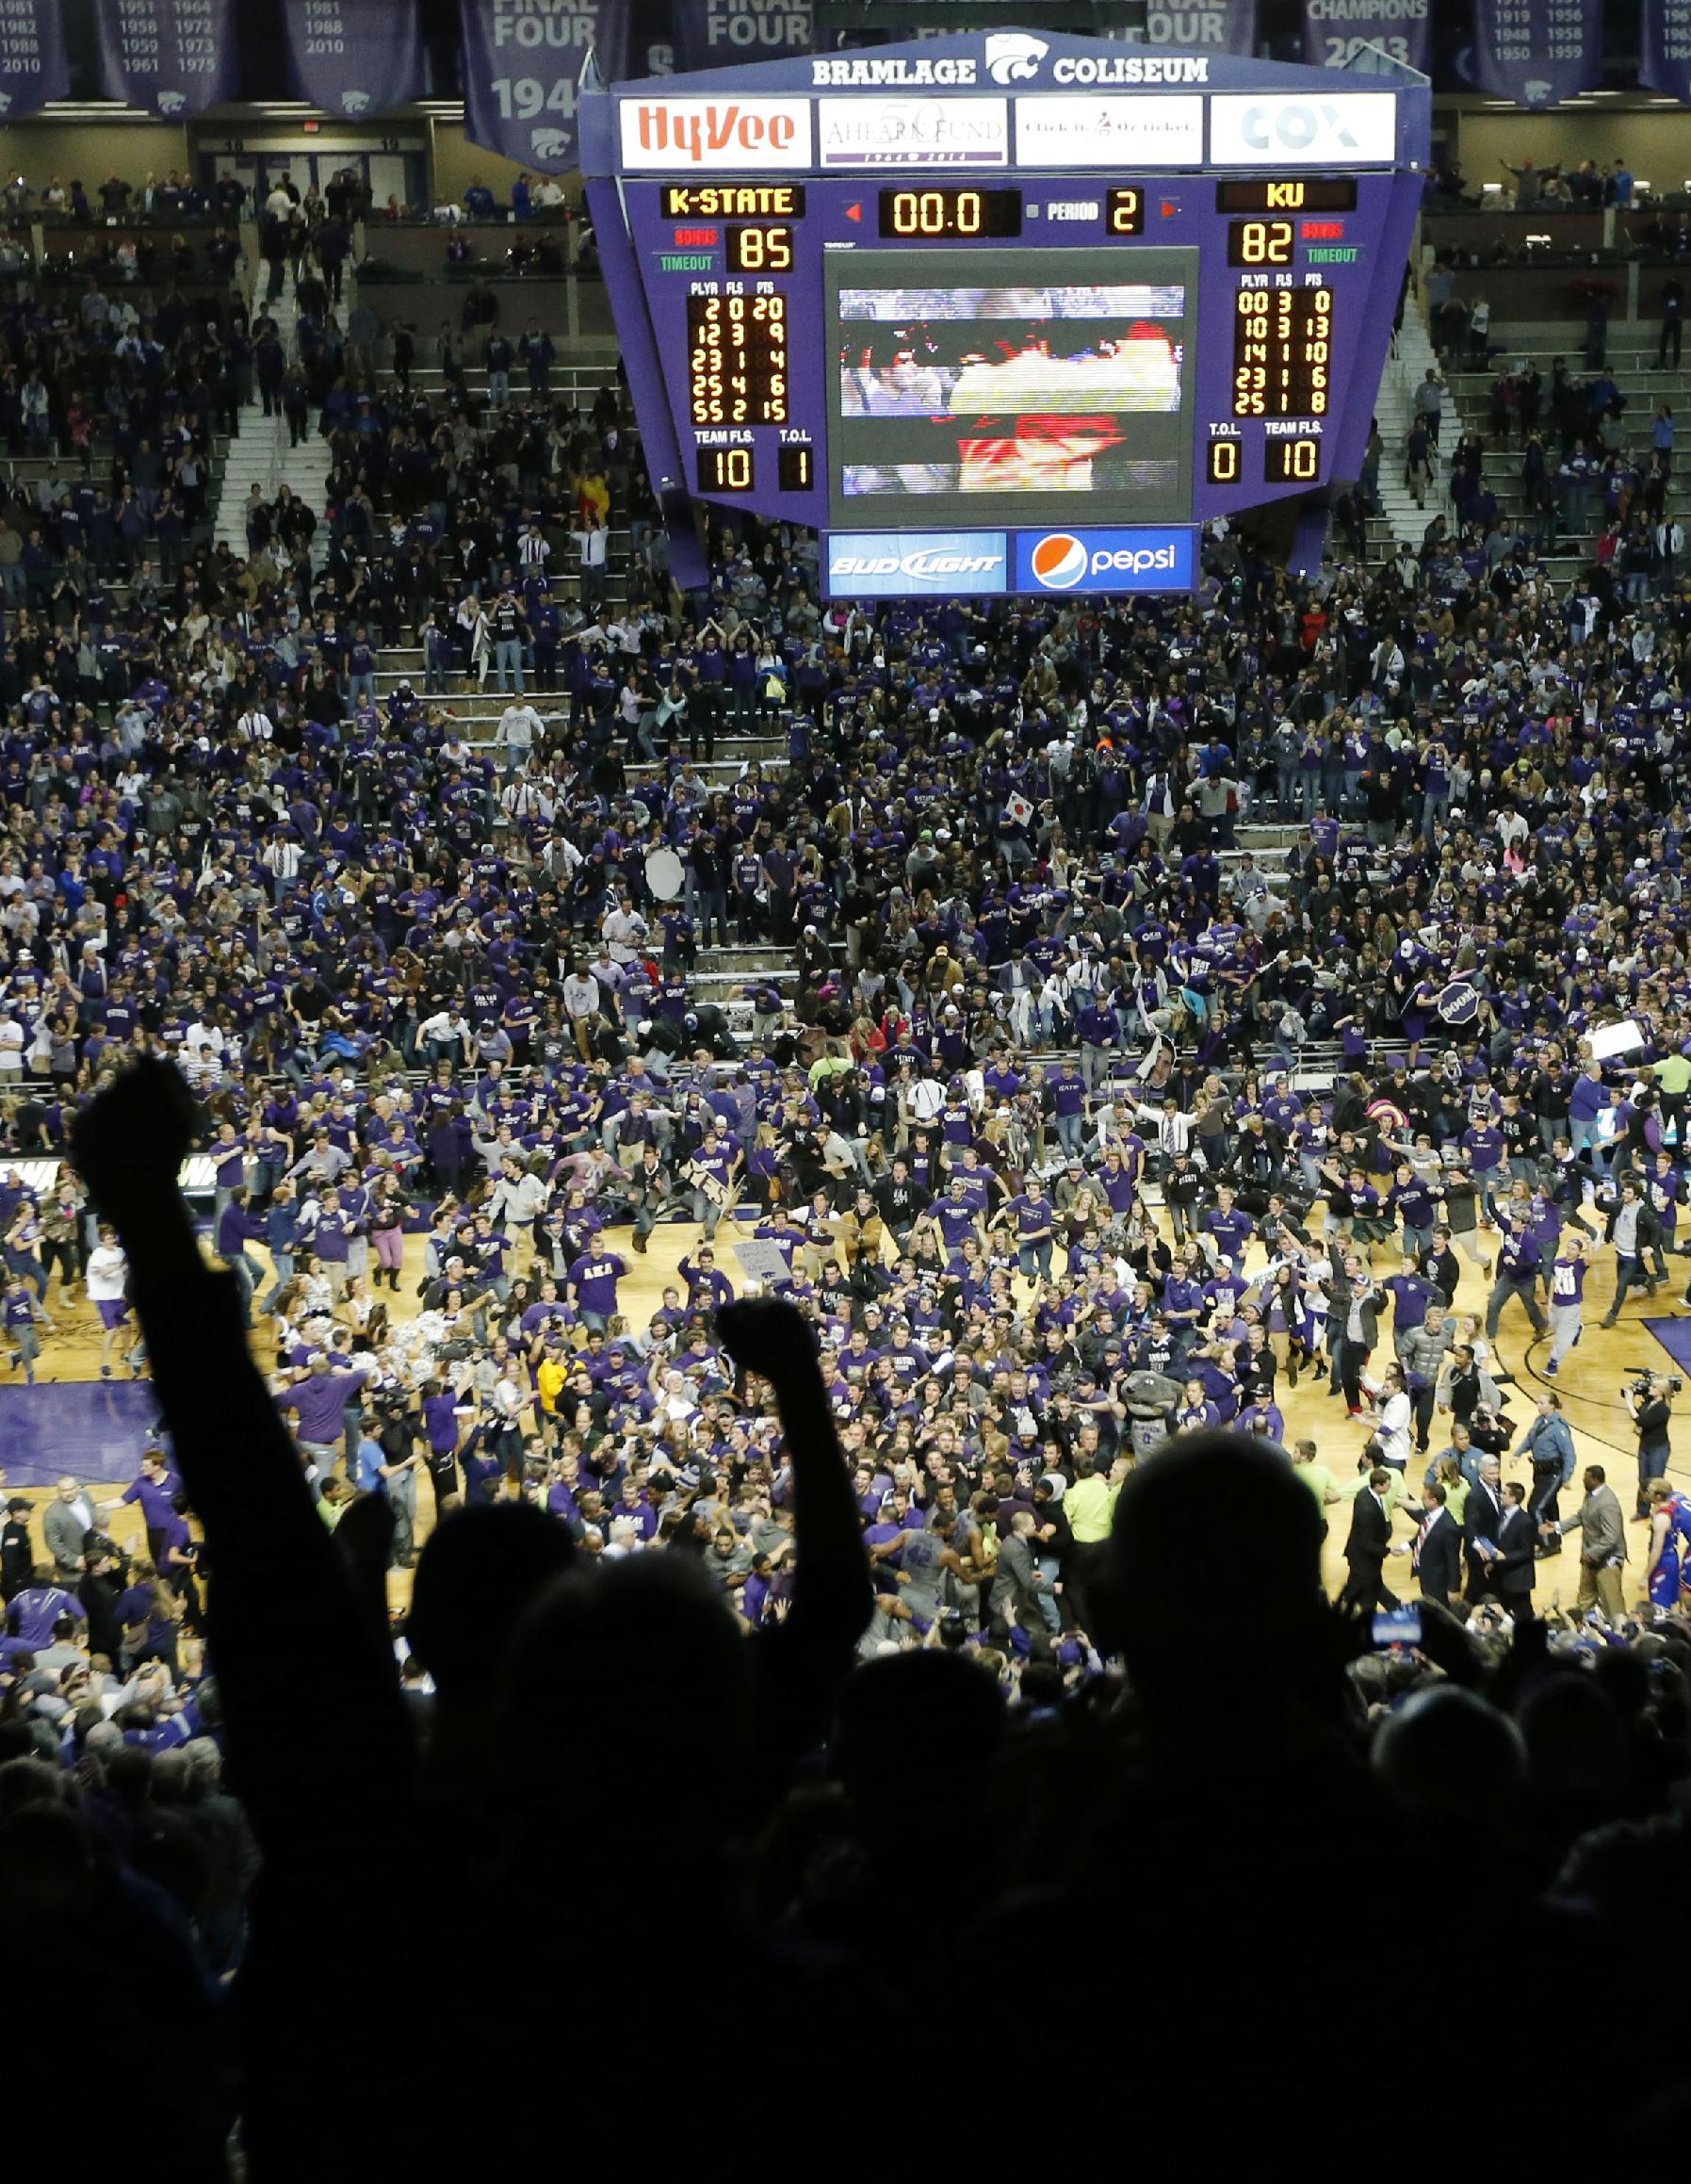 Kansas State fans celebrate following an NCAA college basketball game against Kansas in Manhattan, Kan., Monday, Feb. 10, 2014. Kansas State defeated Kansas 85-82 in overtime